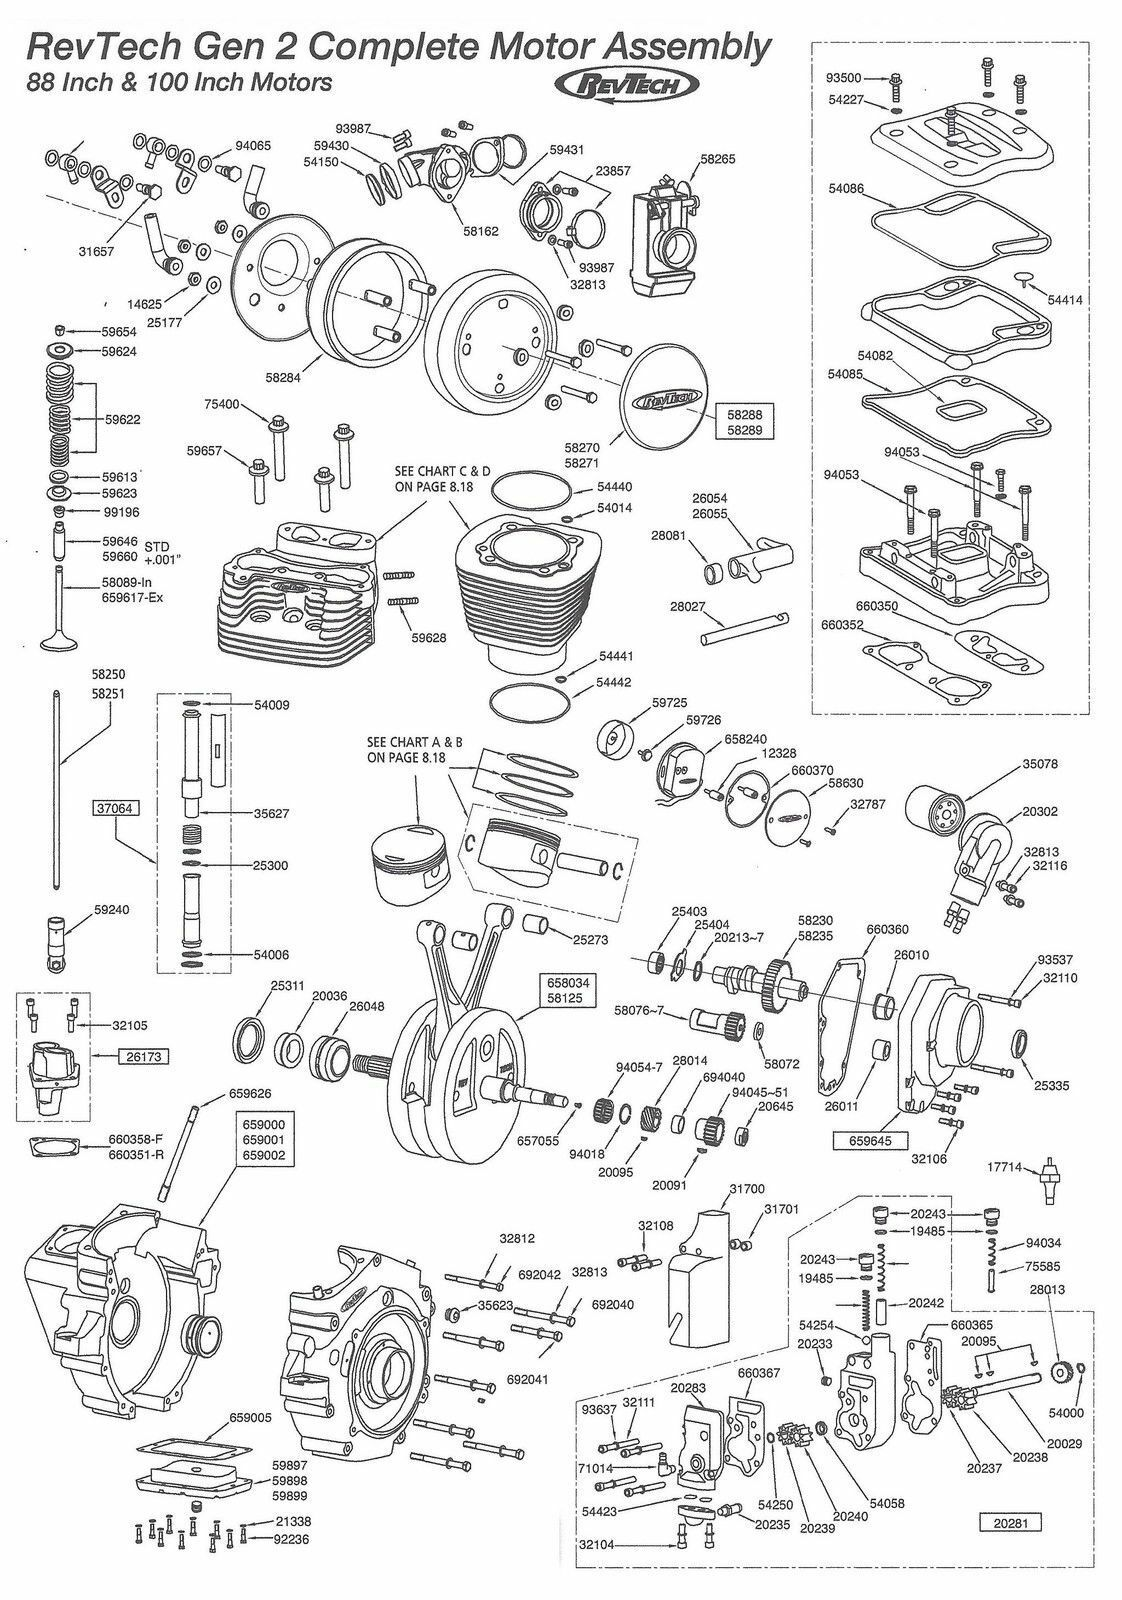 Revtech Ignition Wiring Diagram Toyota Audio Wiring Diagram Begeboy Wiring Diagram Source